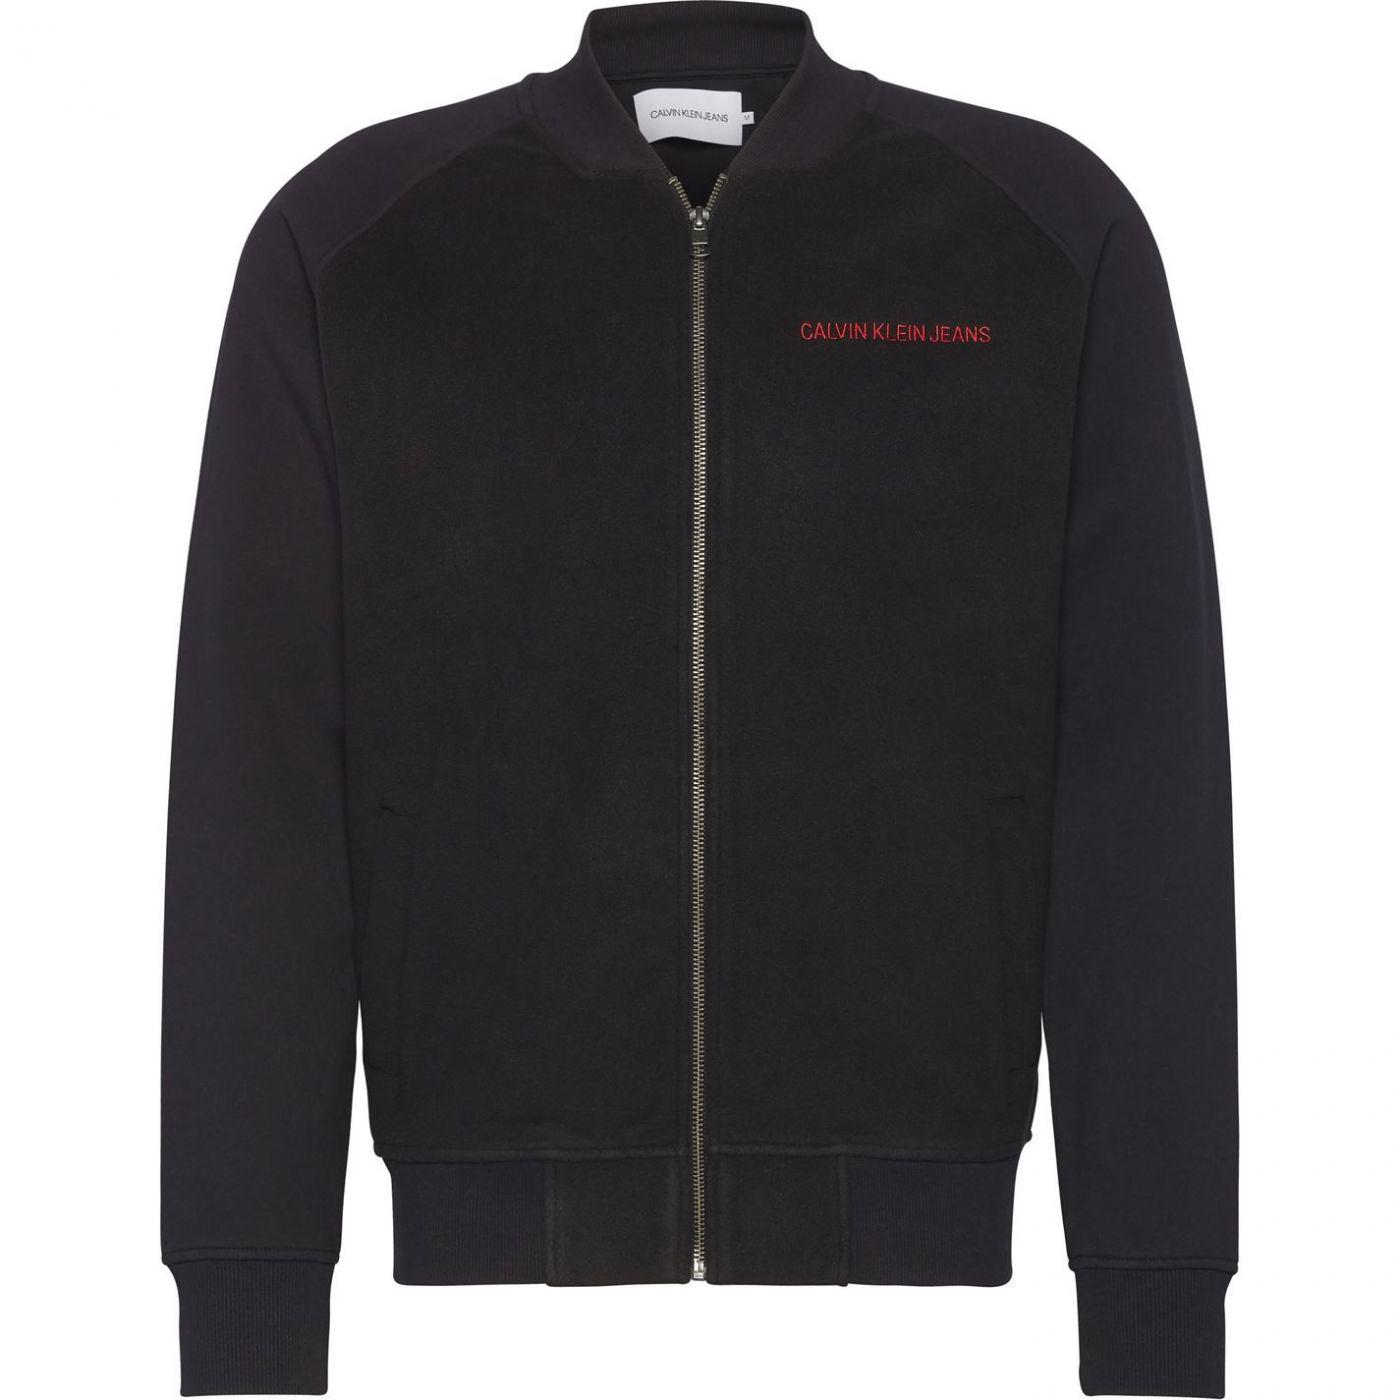 Calvin Klein Jeans Fleece Bomber Jacket